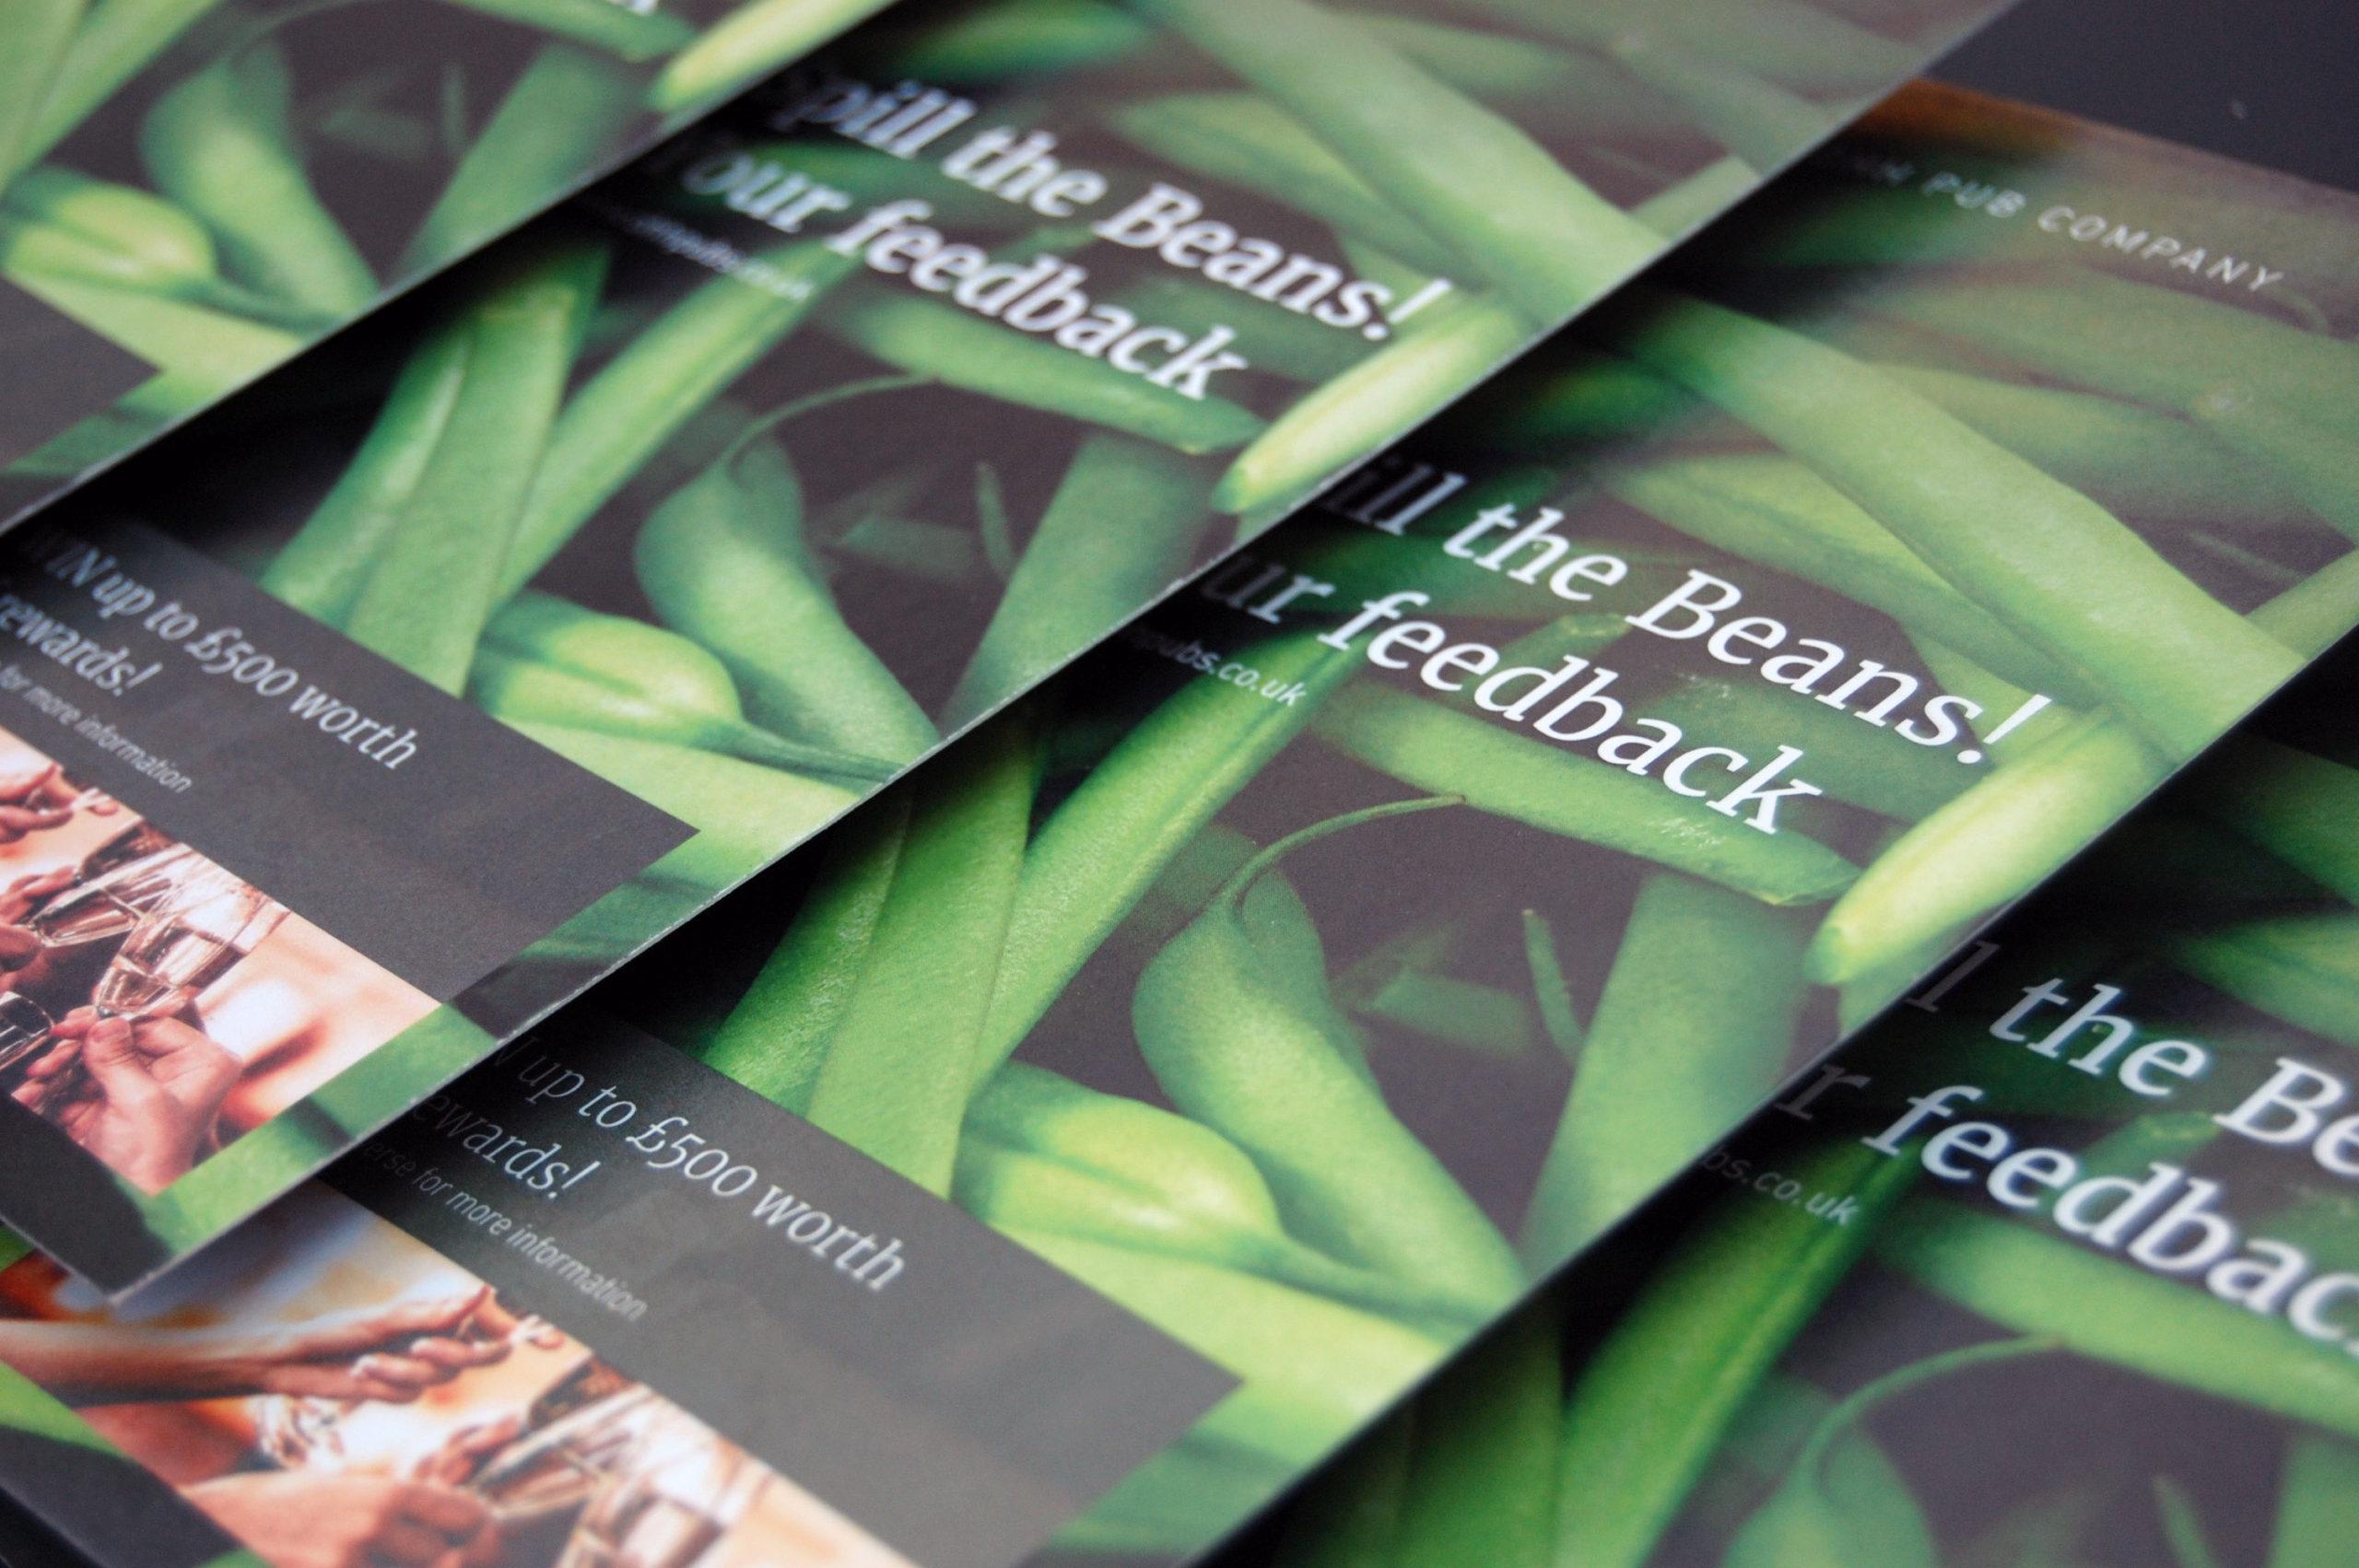 OHH Pub Co Feedback leaflet cover